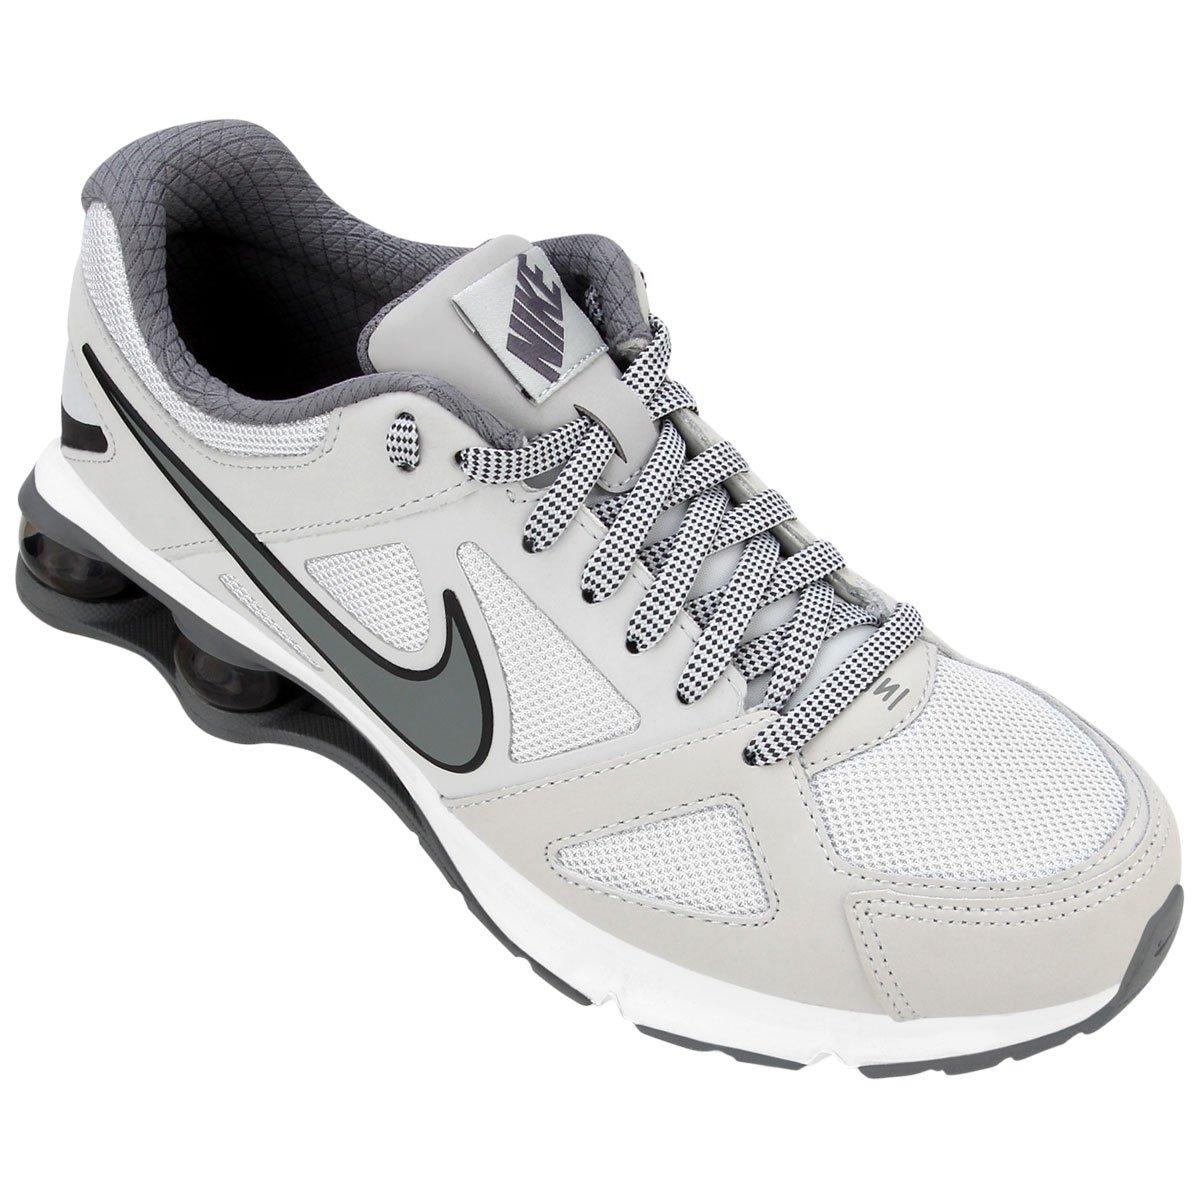 estafa Terrible Incomodidad  Tênis Nike Air Shox 2013 | Shop Timão